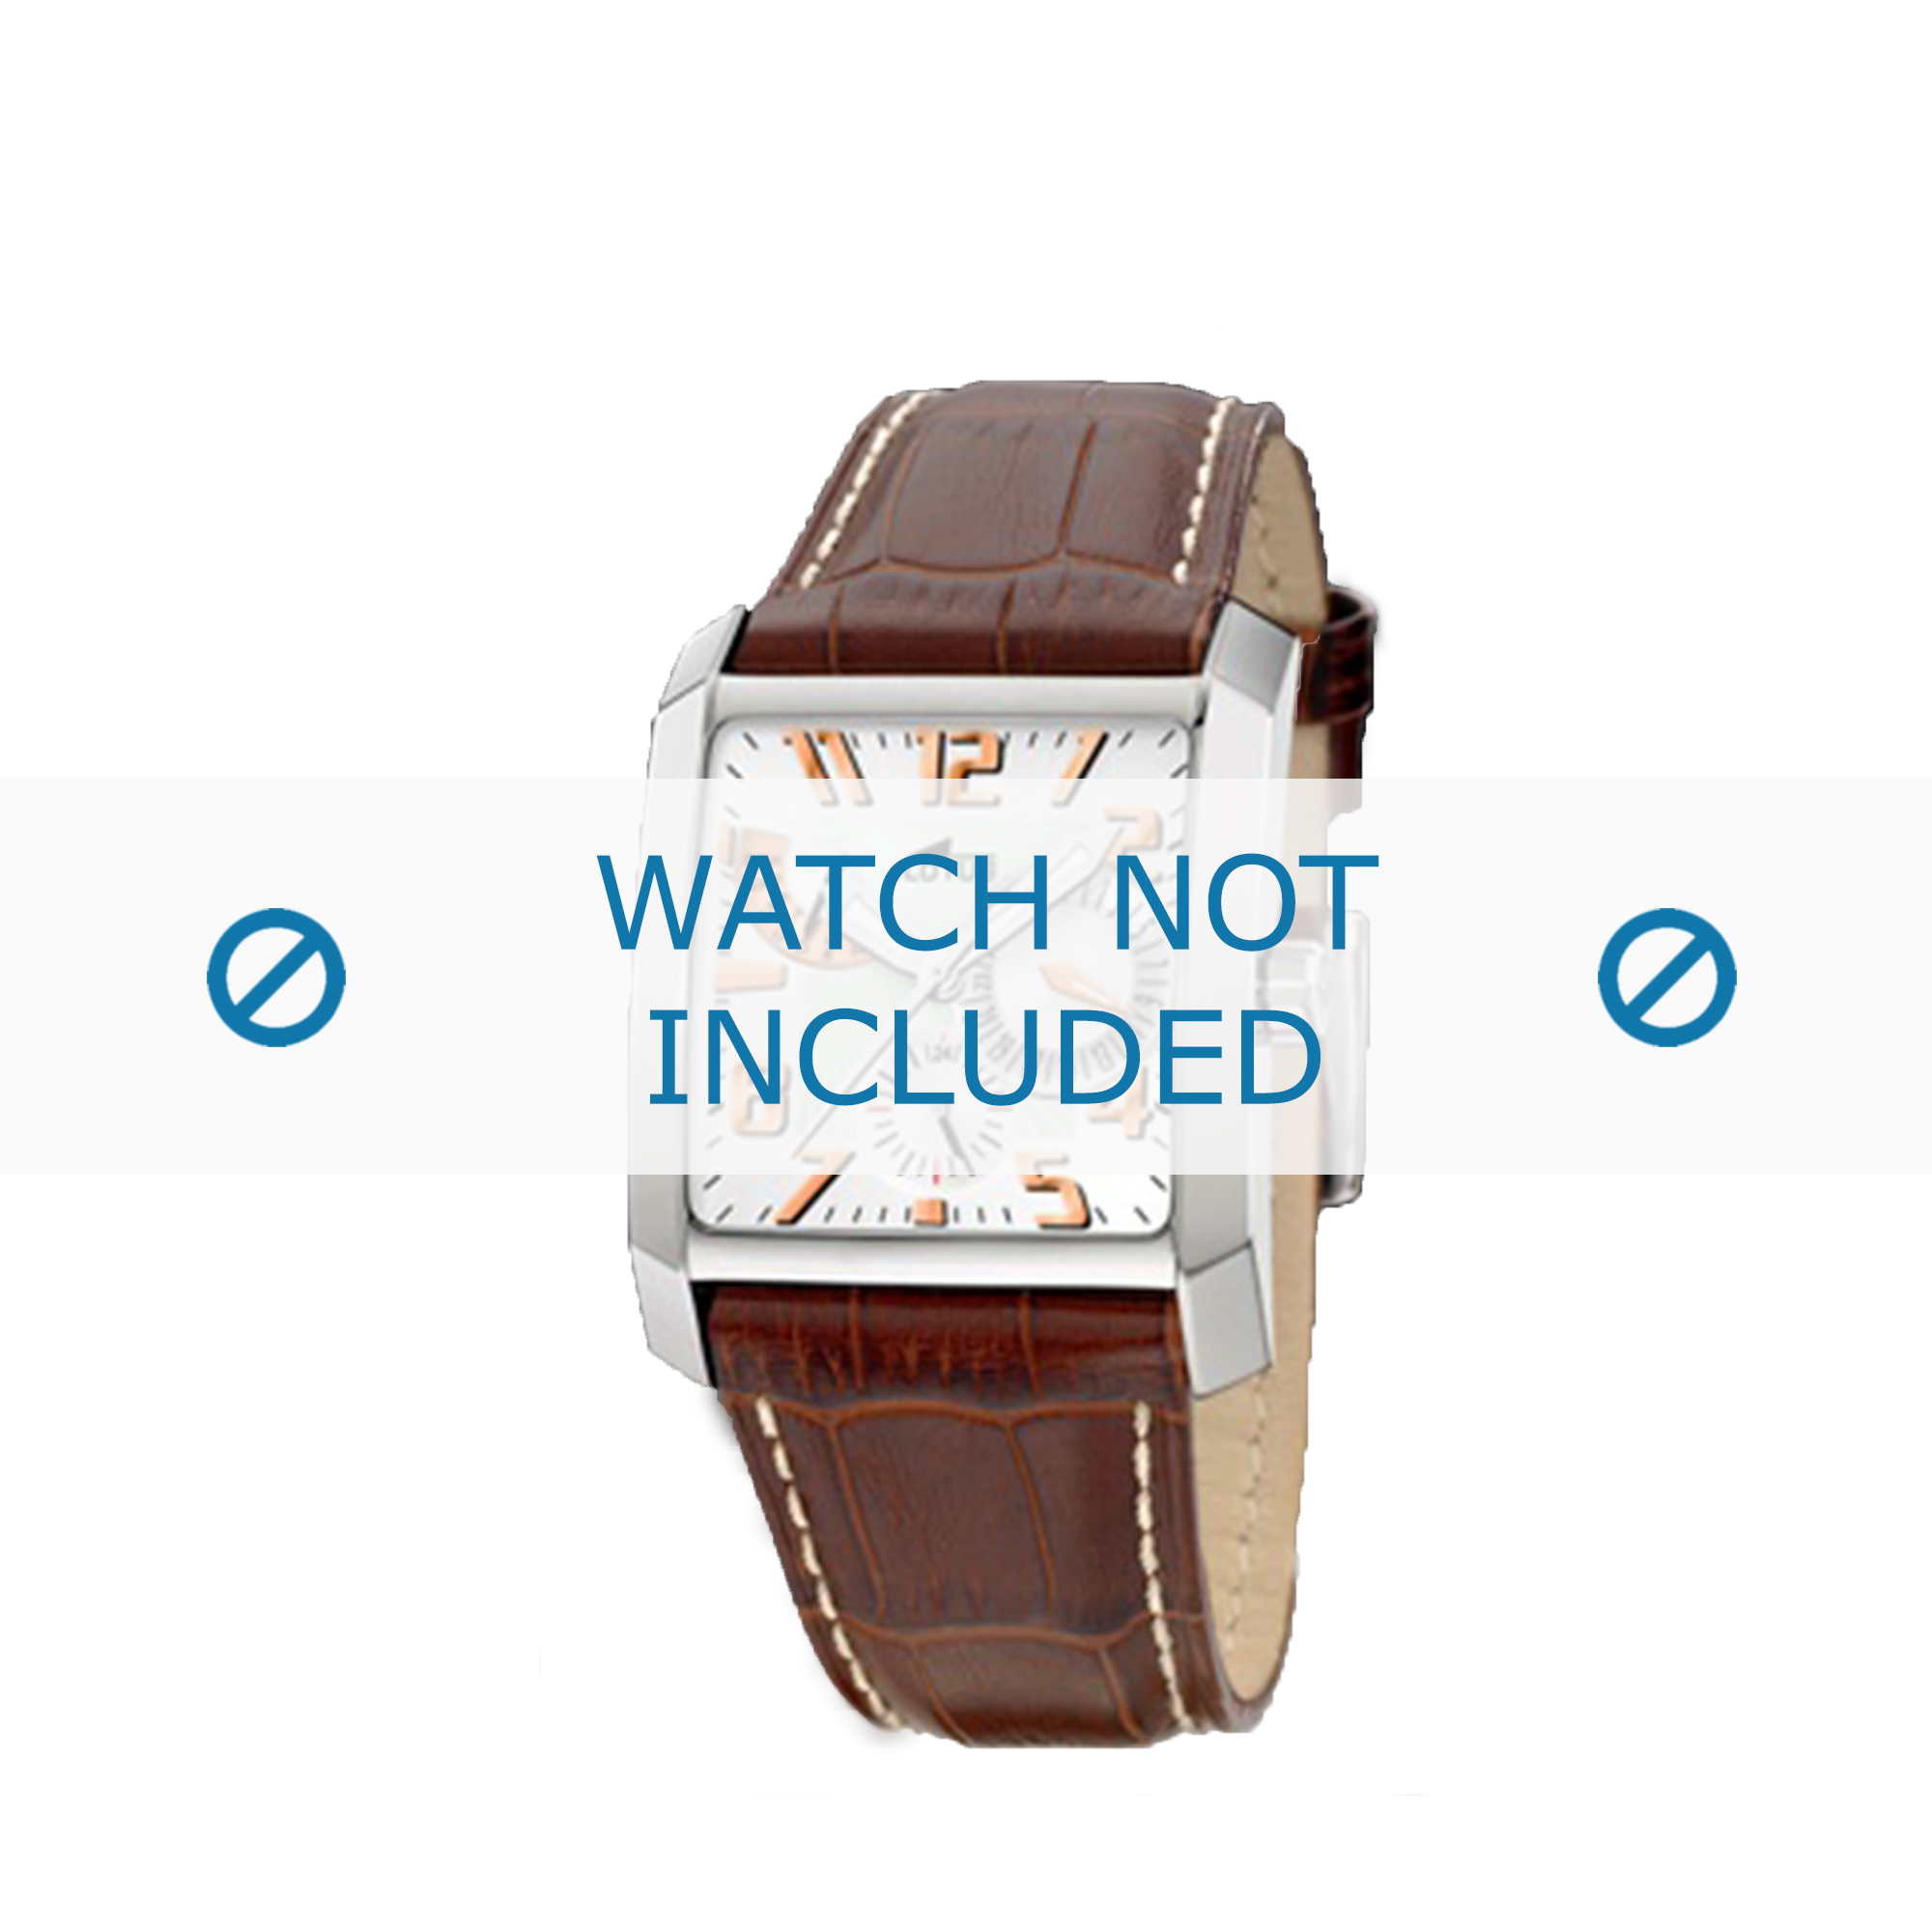 Lotus horlogeband 15411.1 / 15411.7 Leder Bruin + wit stiksel